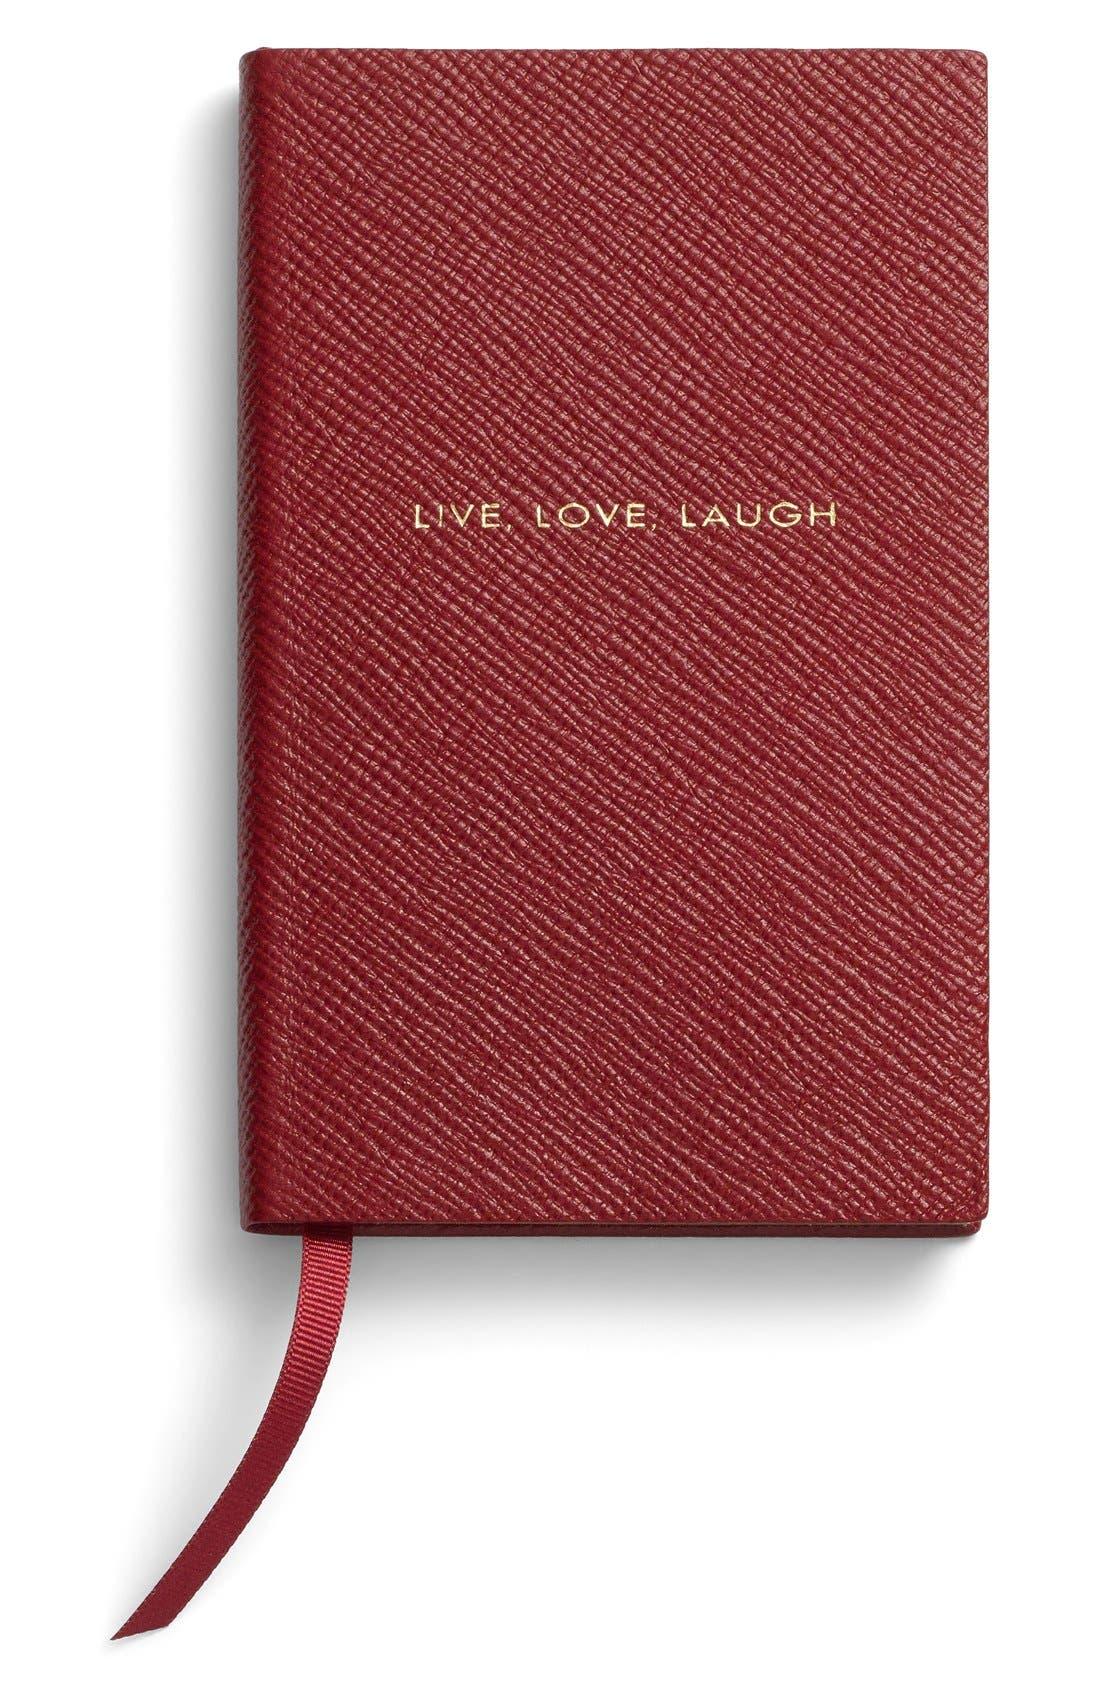 Main Image - Smythson 'Live Love Laugh Panama' Pocket Notebook